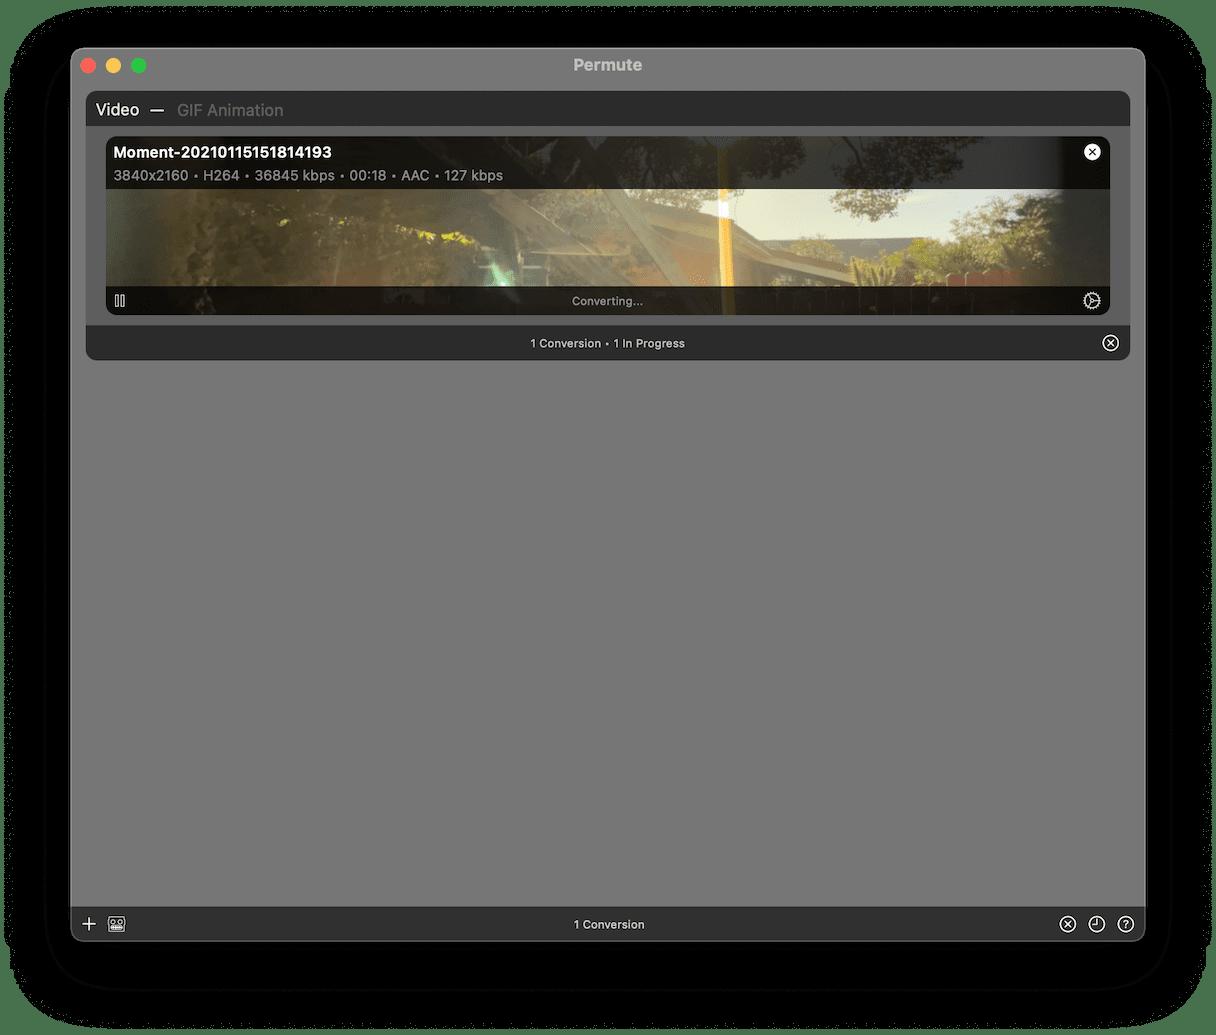 Permute interface